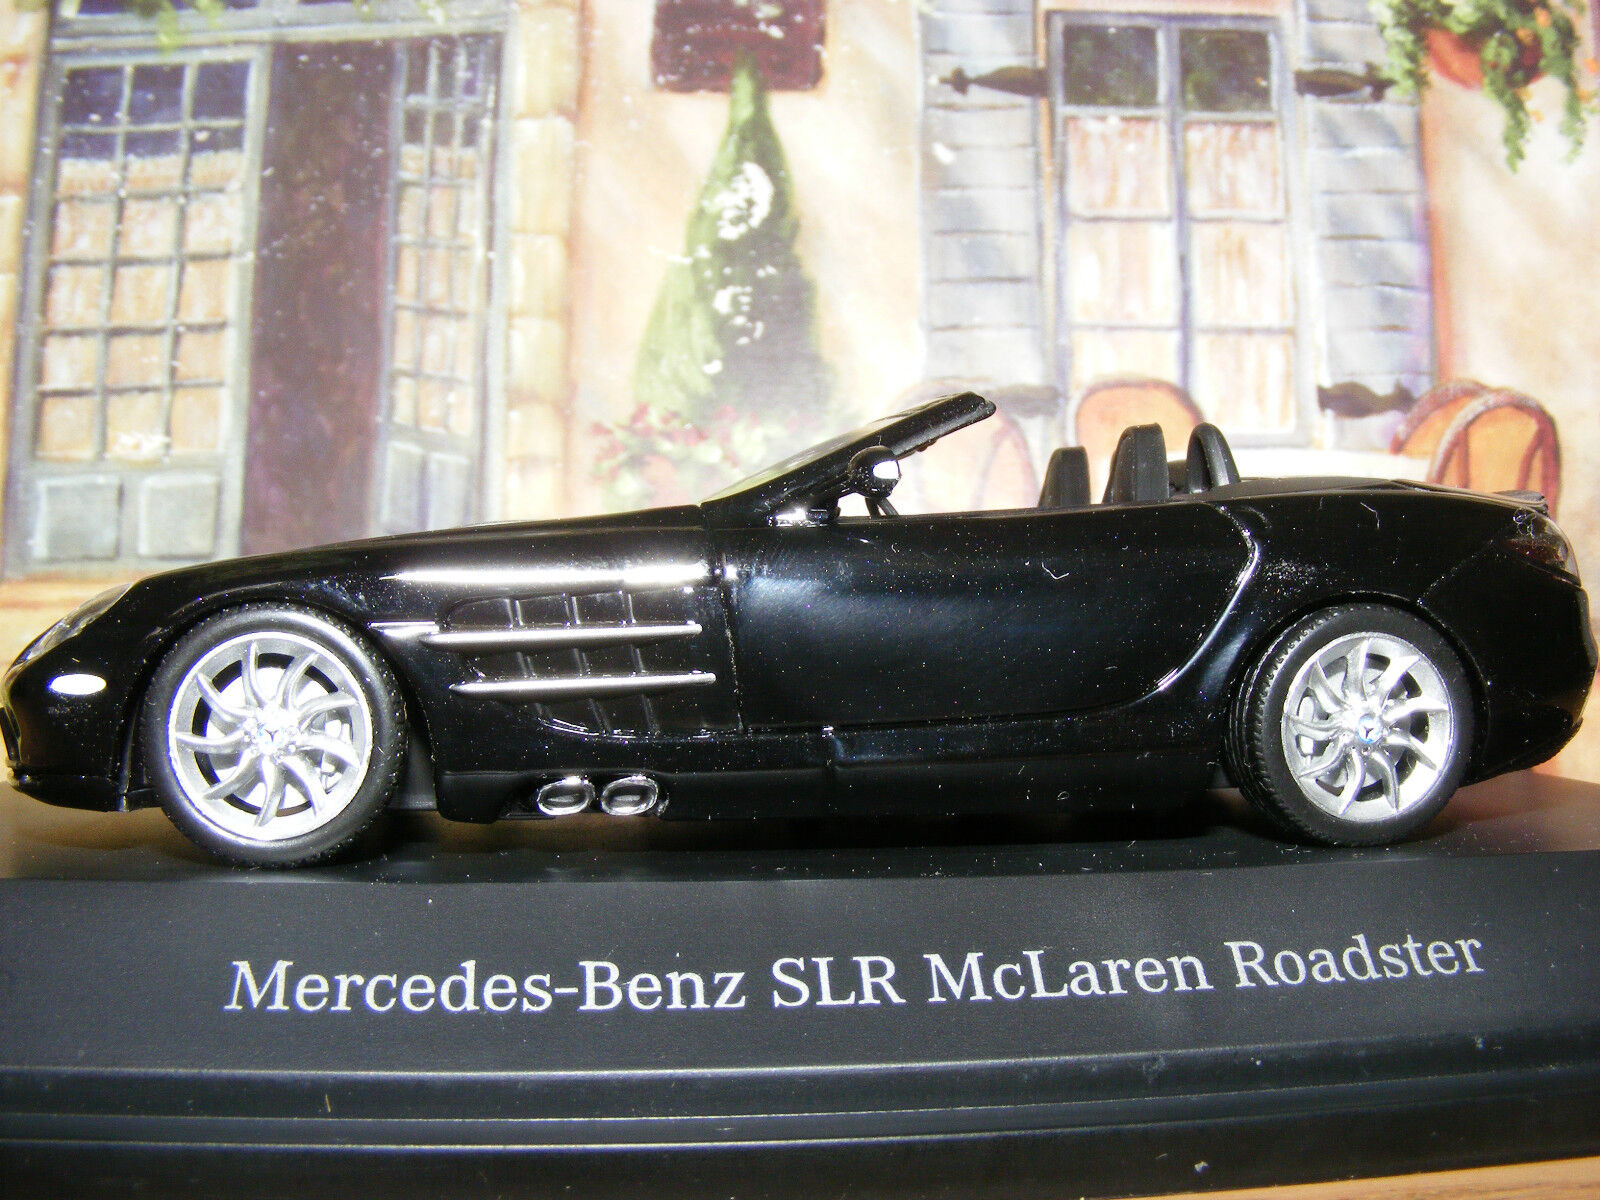 Mercedes-Benz SLR McLaren Roadster 2007 Minichamps Escala en negro 1 43rd.